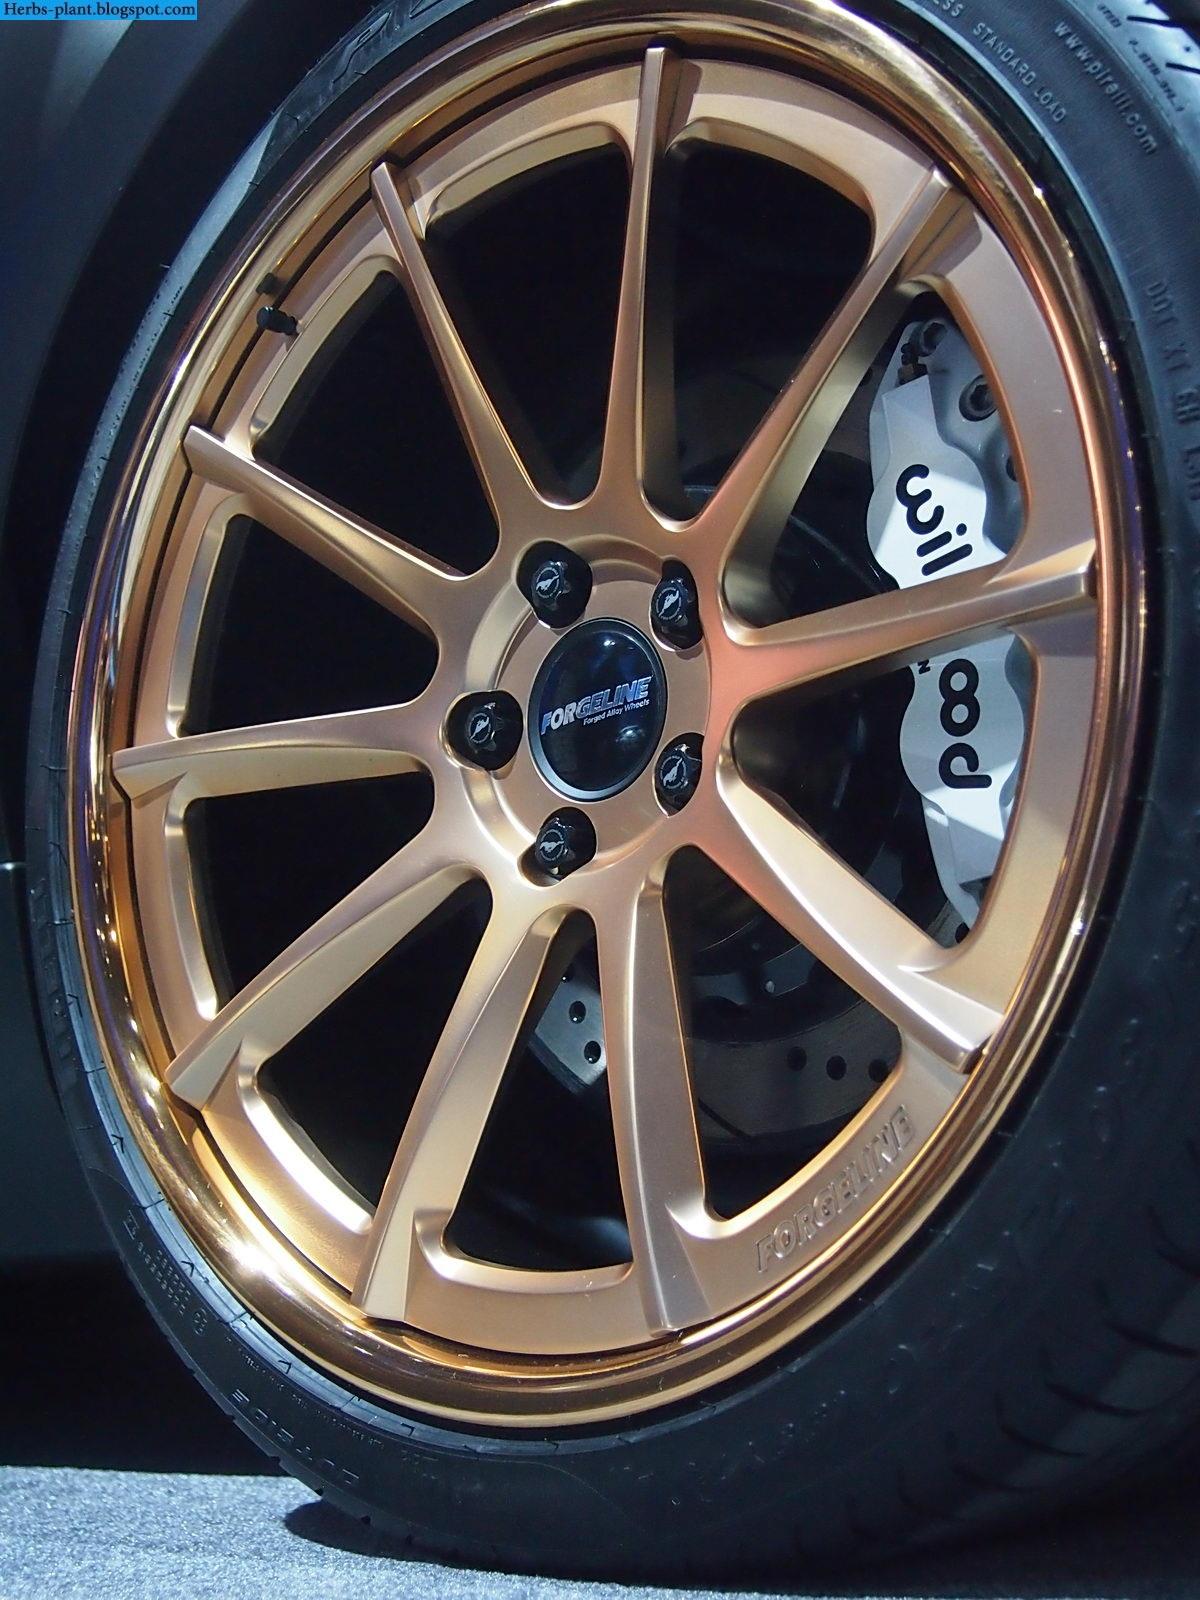 Ford mustang car 2013 tyres/wheels - صور اطارات سيارة فورد موستانج 2013